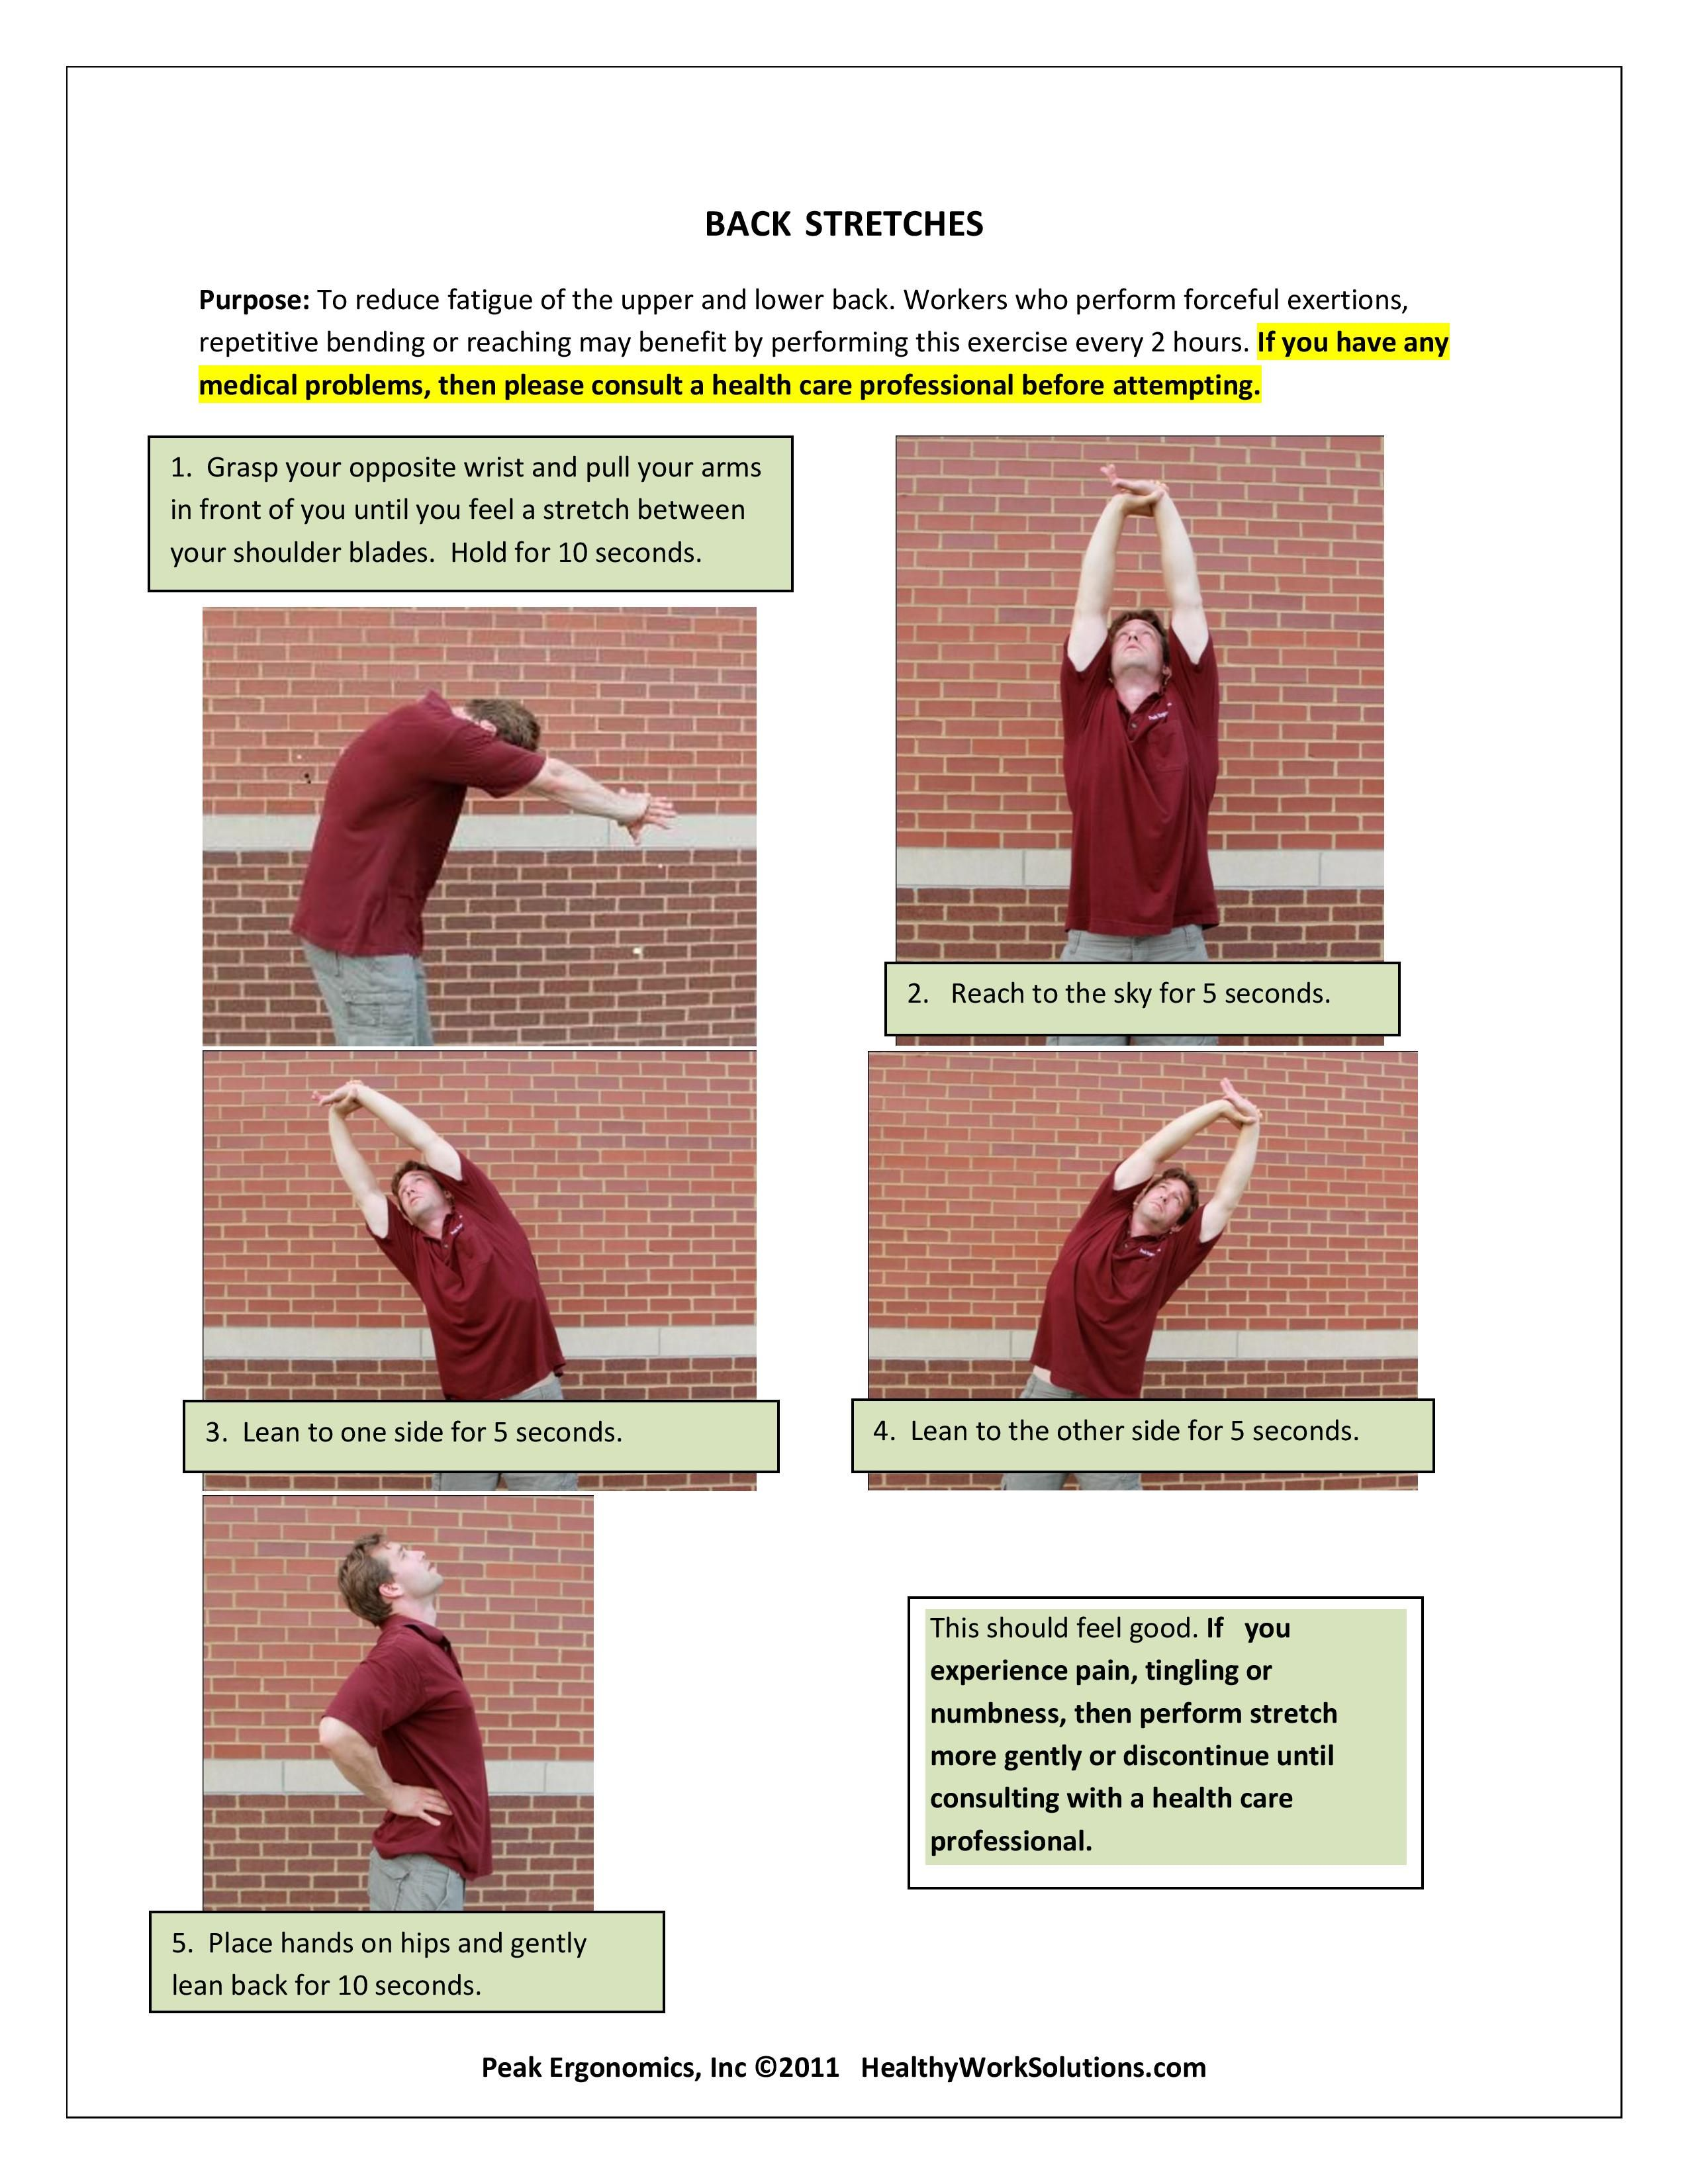 Ergonomics 101 preventative streching series part 2